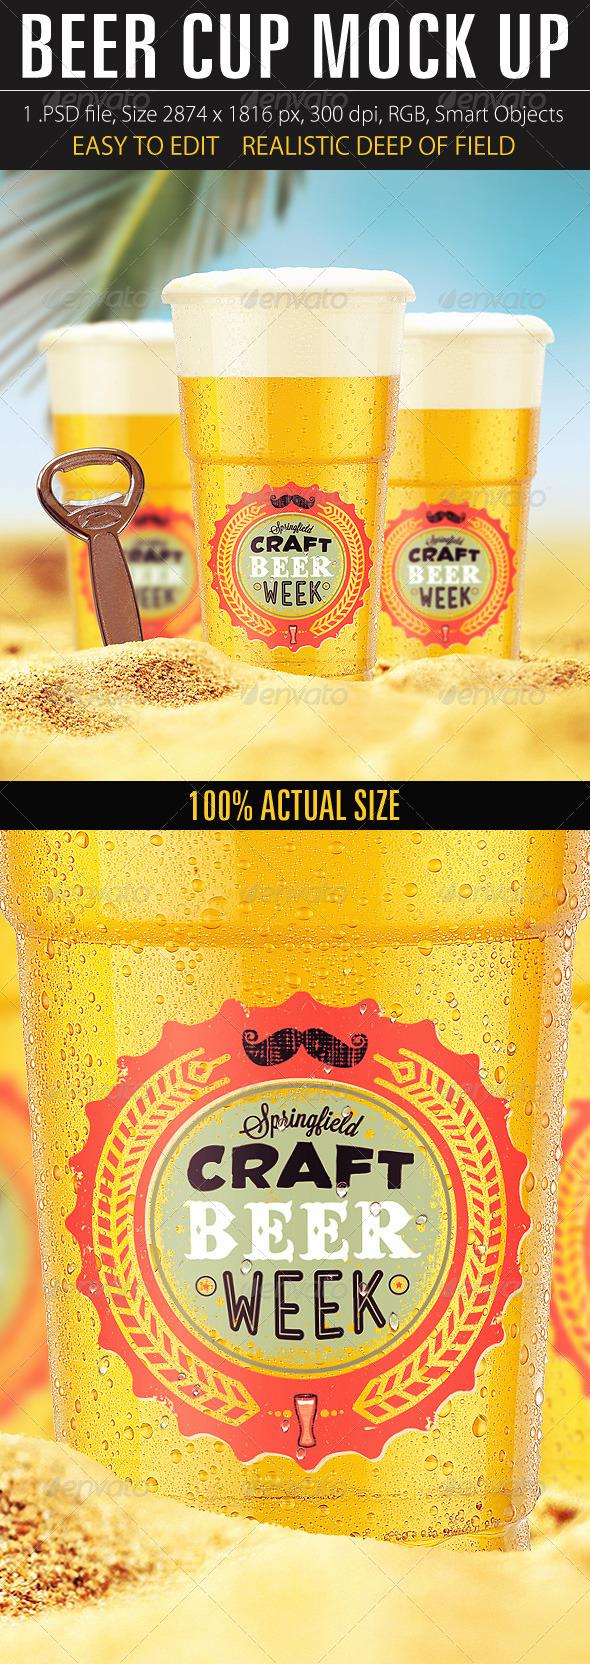 Beer Cup Mock Up - Food and Drink Packaging